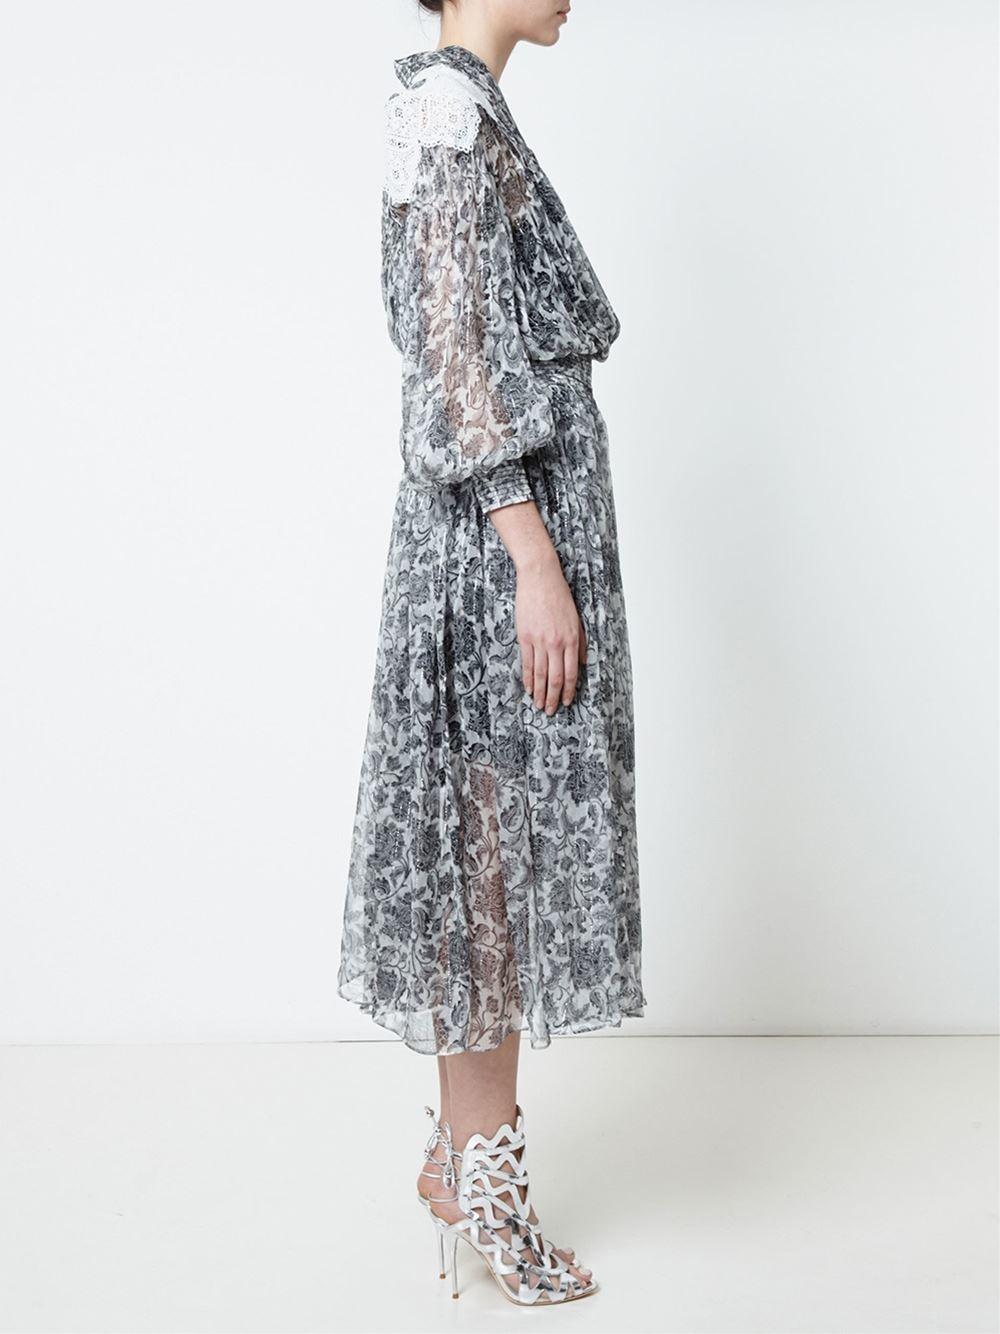 Lyst zimmermann empire embroidered dress in black